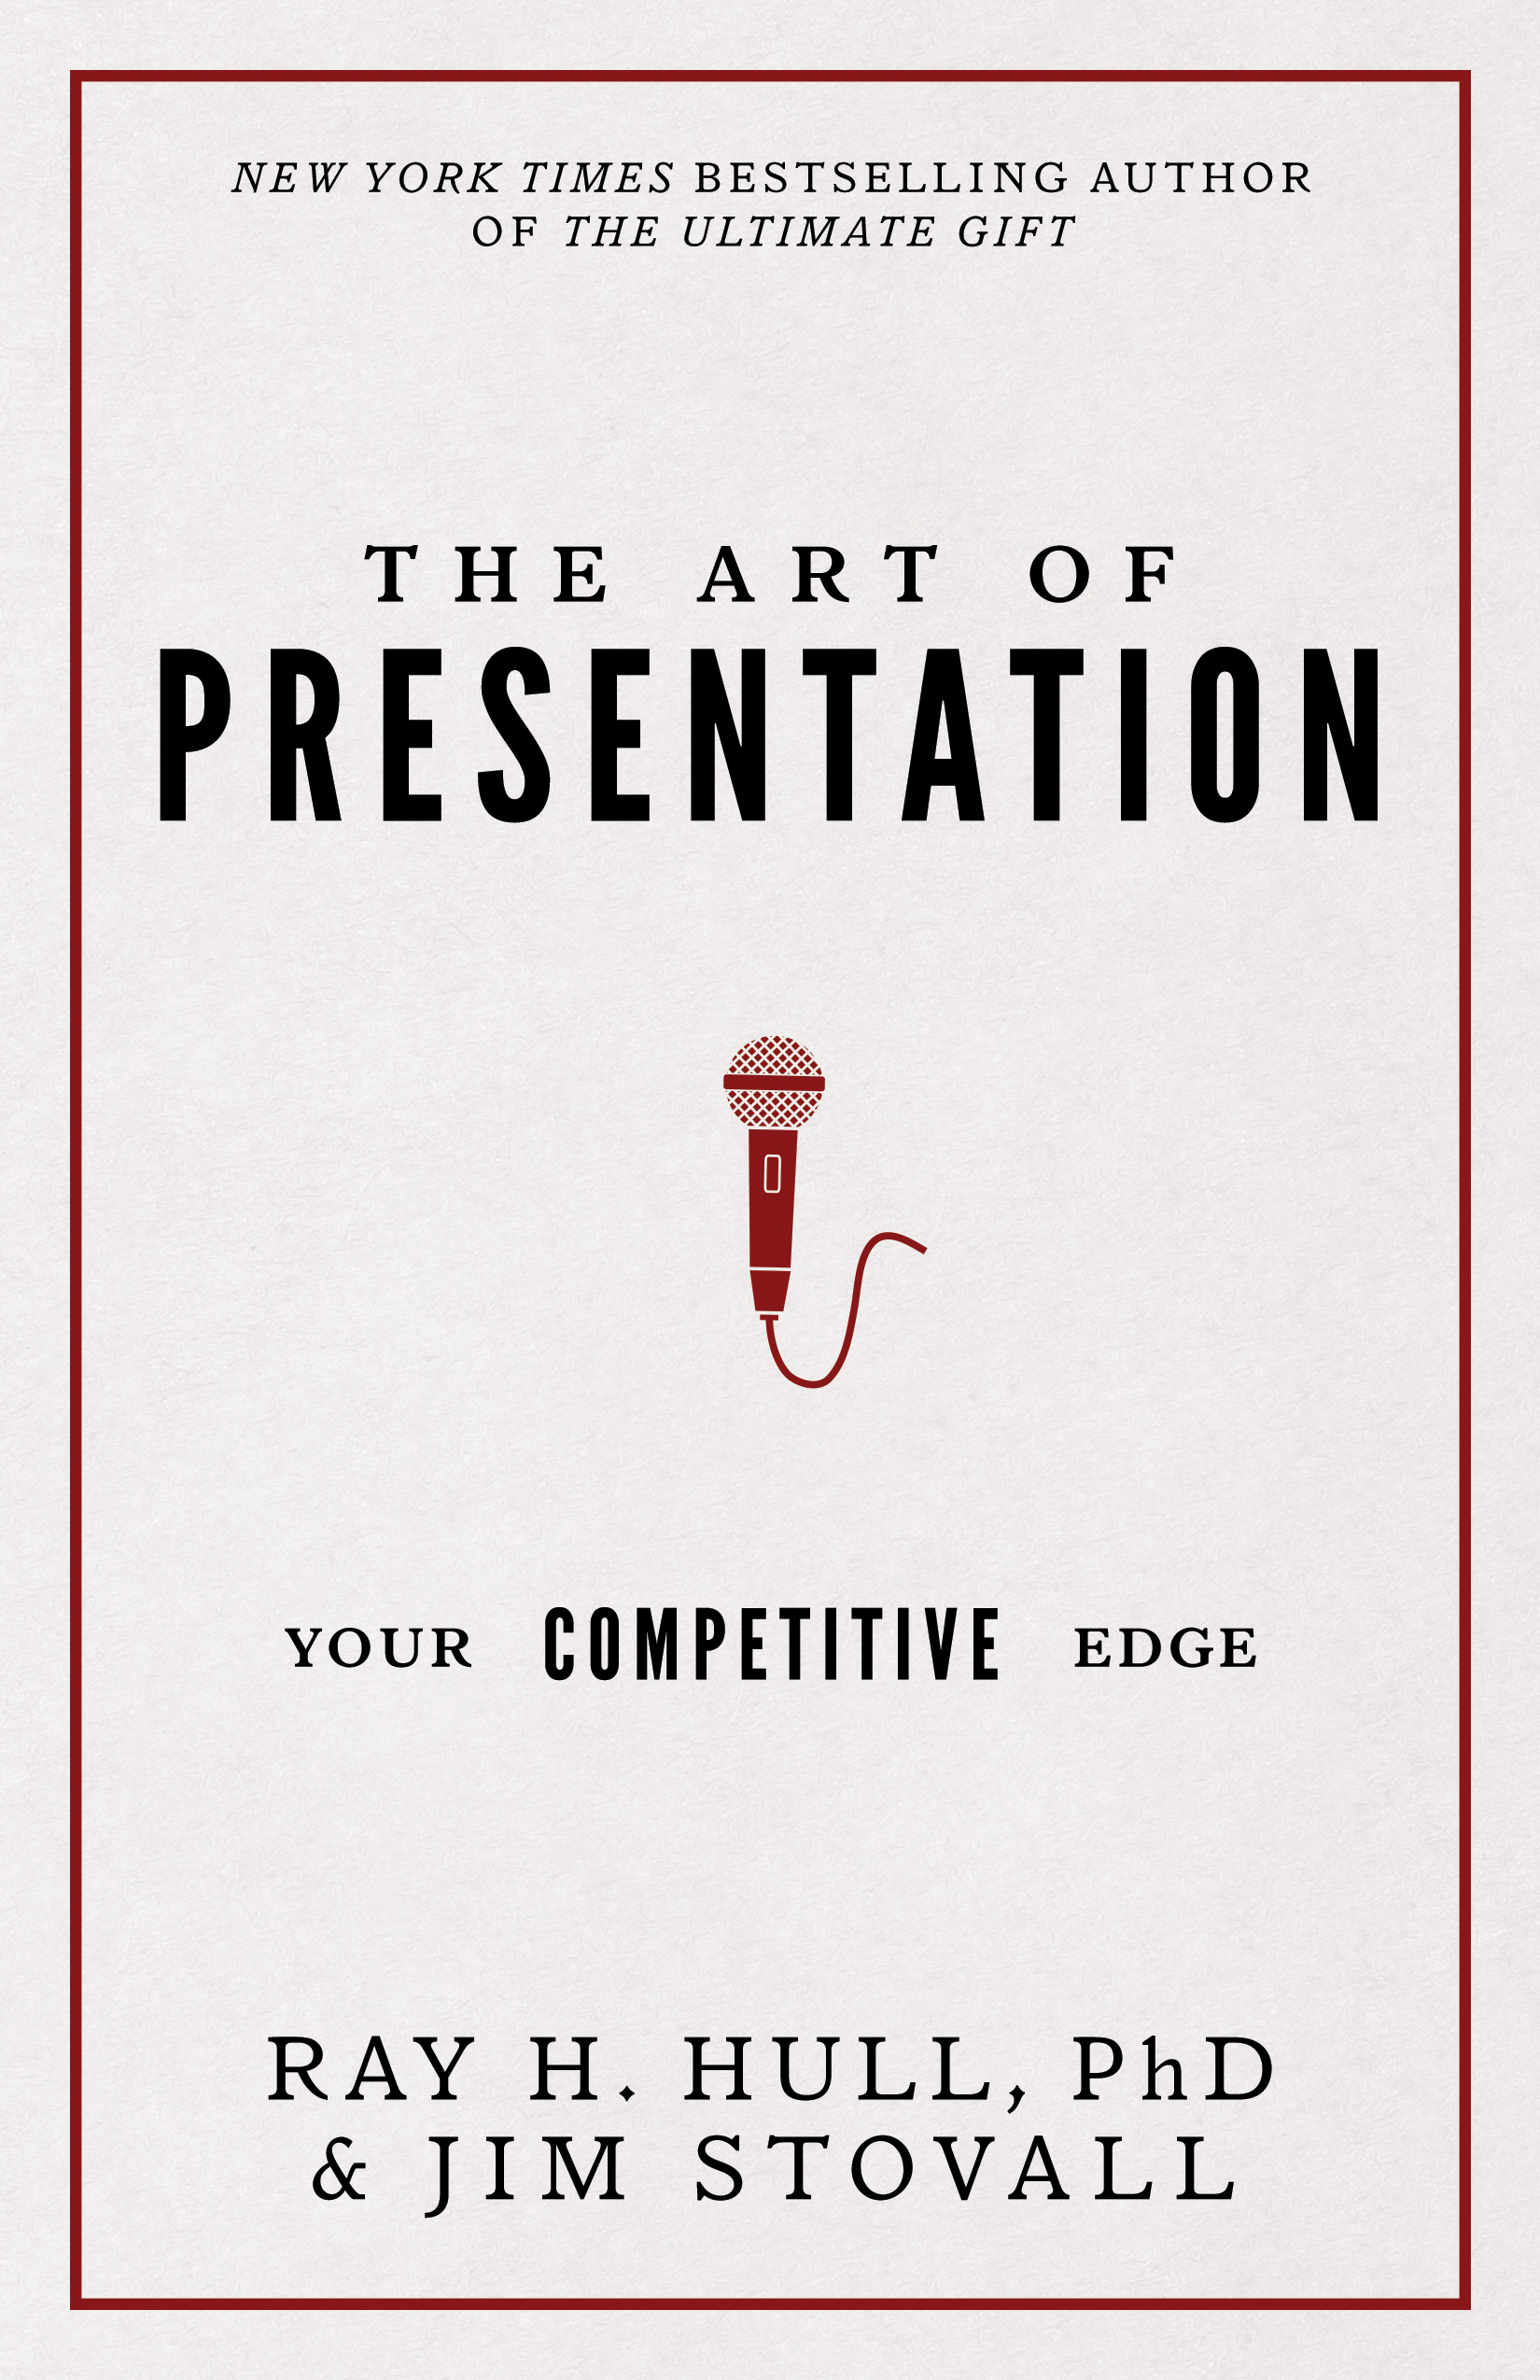 The Art of Presentation - By ray h. hull, phd & Jim stovall